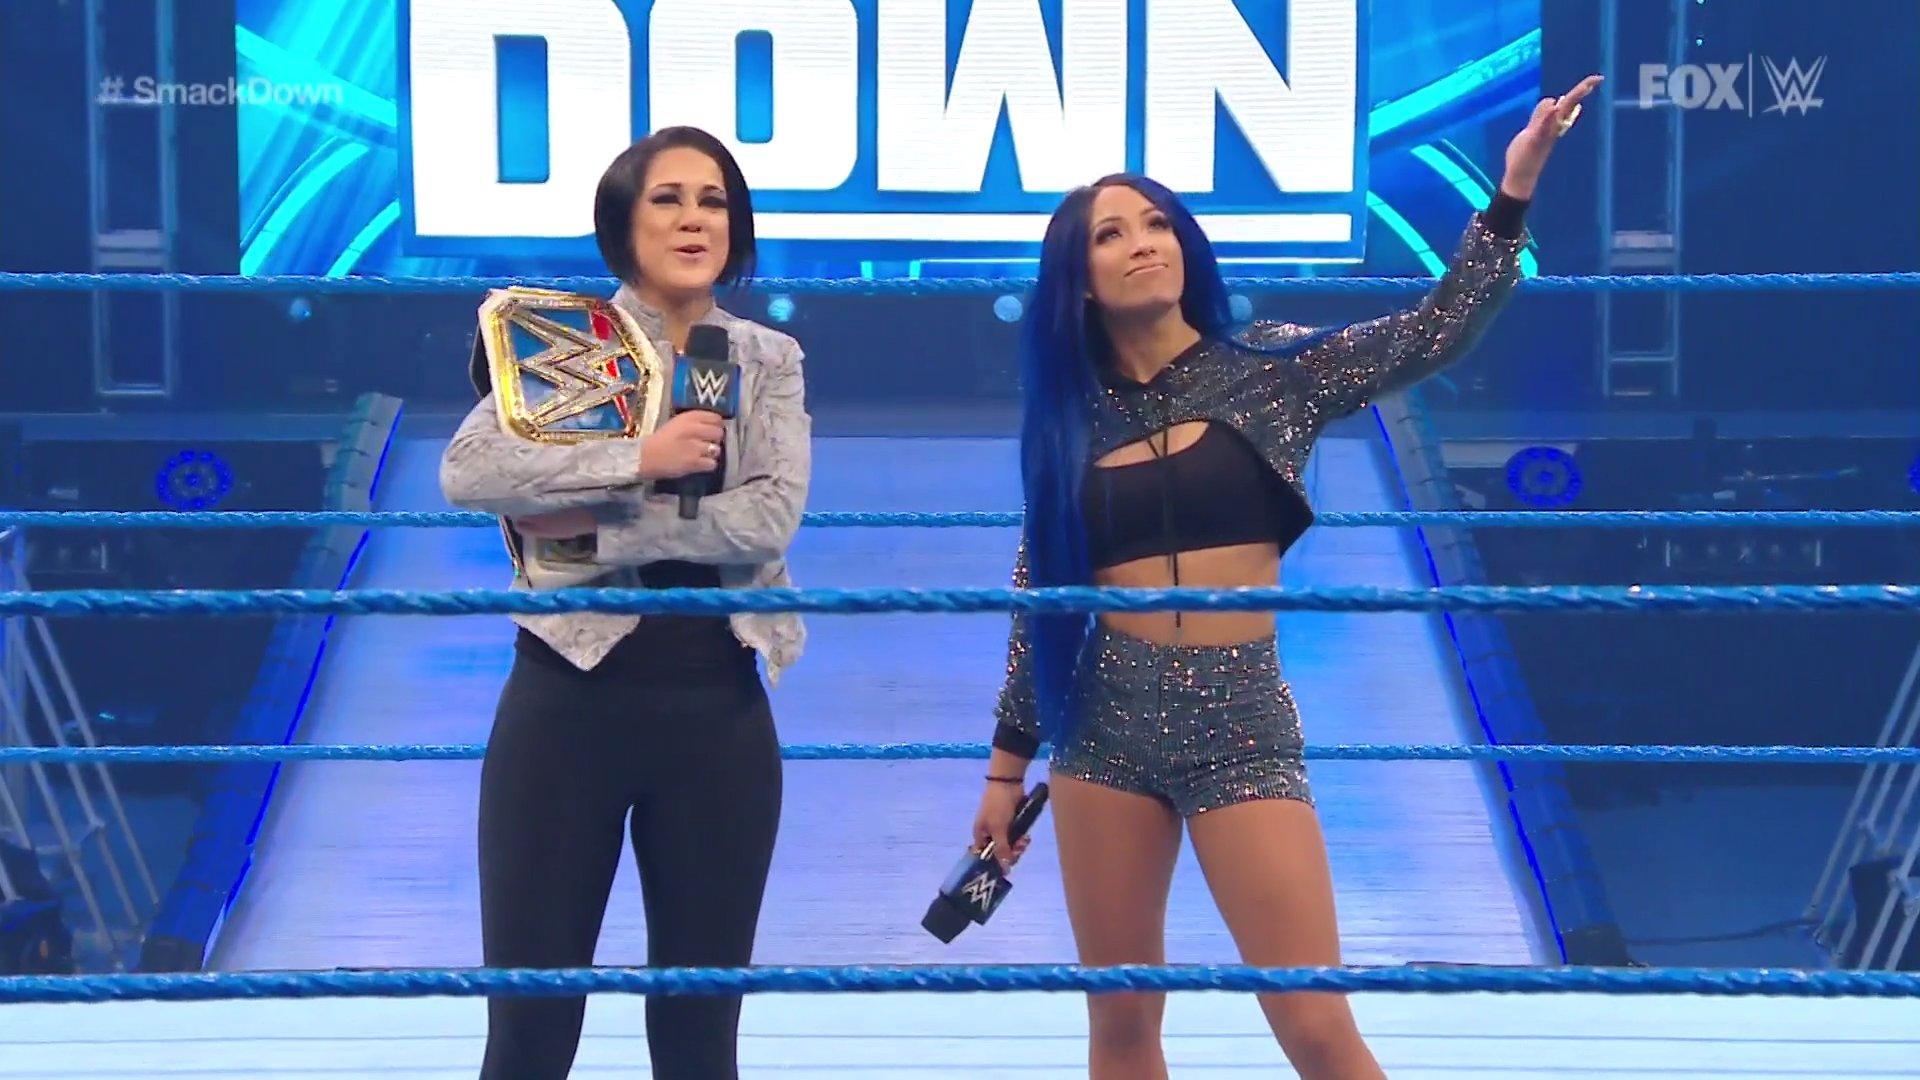 WWE SMACKDOWN (27 de marzo 2020)   Resultados en vivo   Drew Gulak vs. Shinsuke Nakamura 1